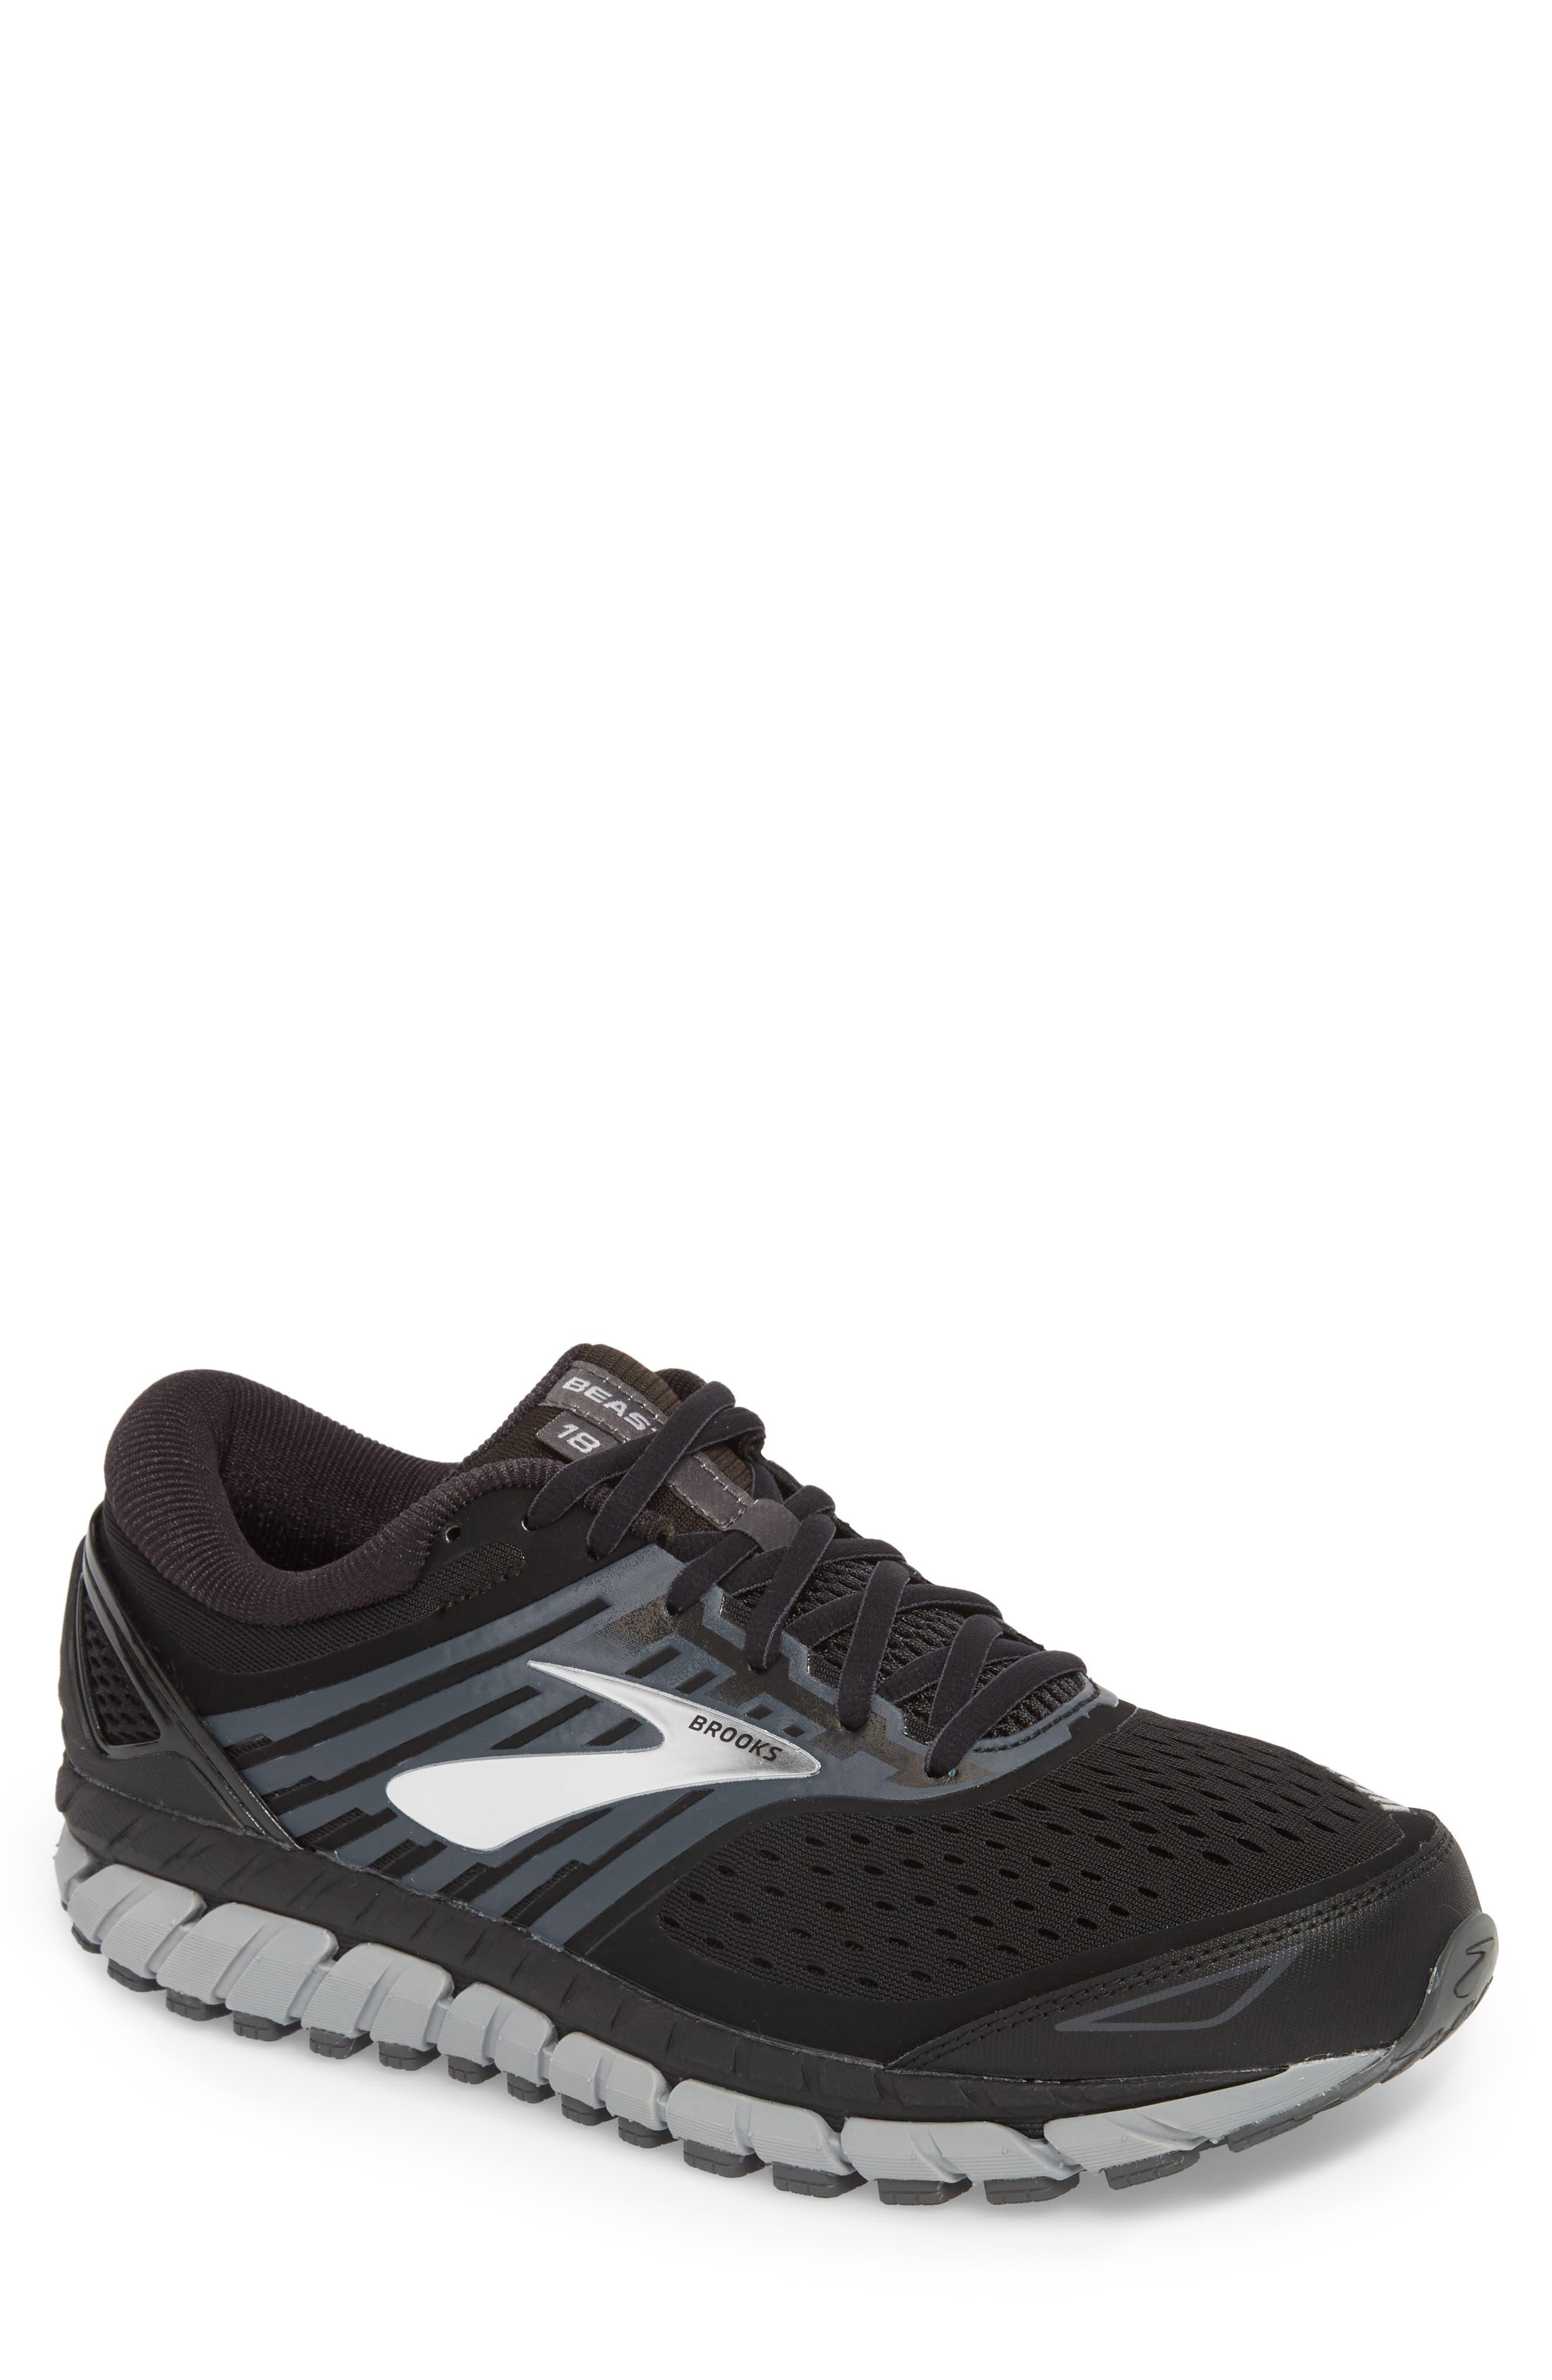 Beast '18 Running Shoe,                             Main thumbnail 1, color,                             BLACK/ GREY/ SILVER